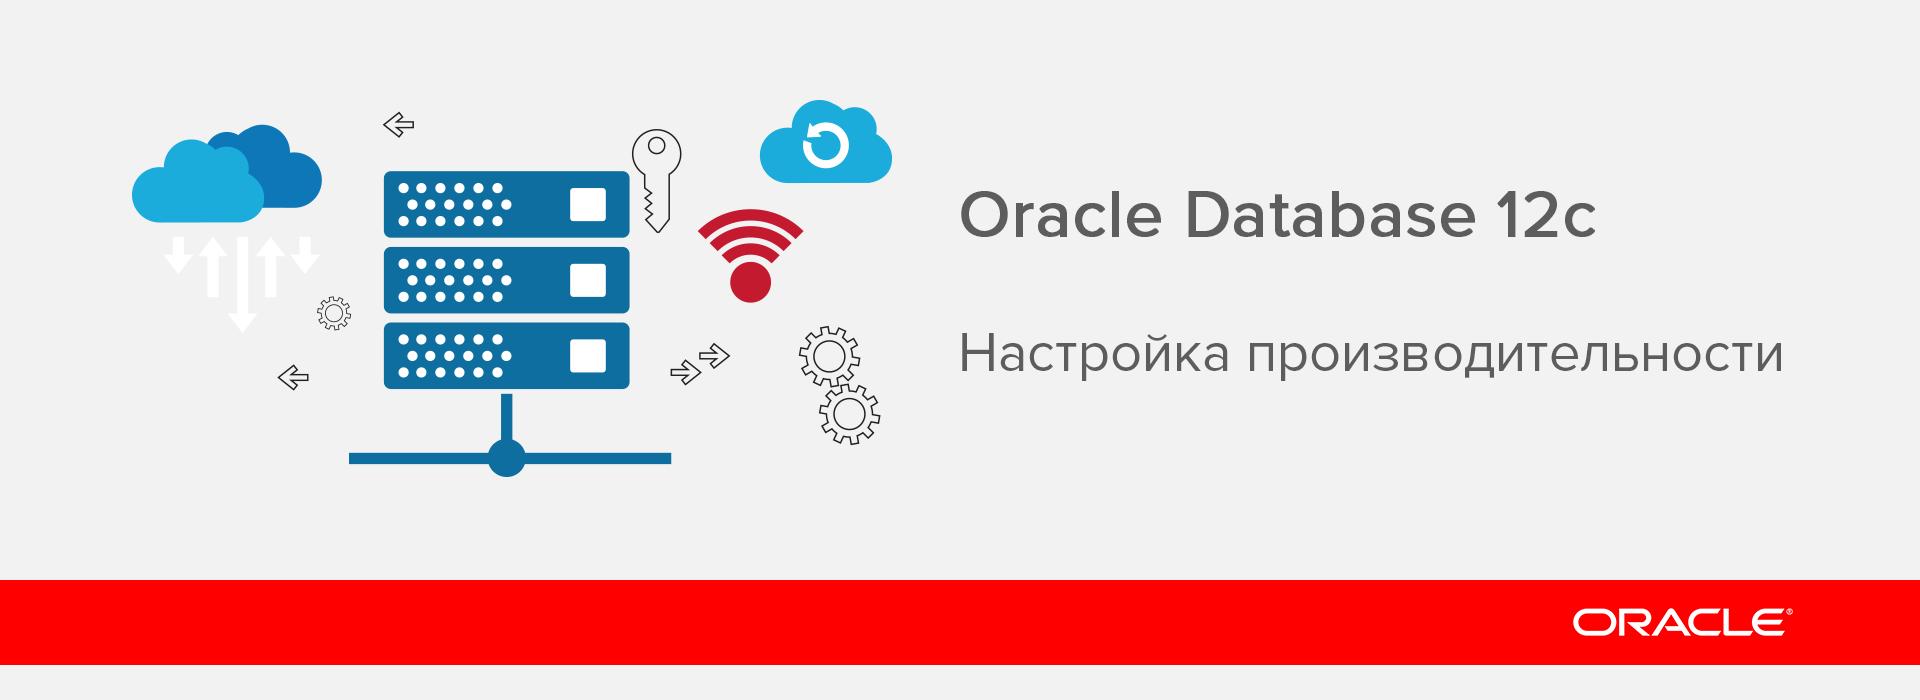 Oracle Database 12c: настройка производительности - 1